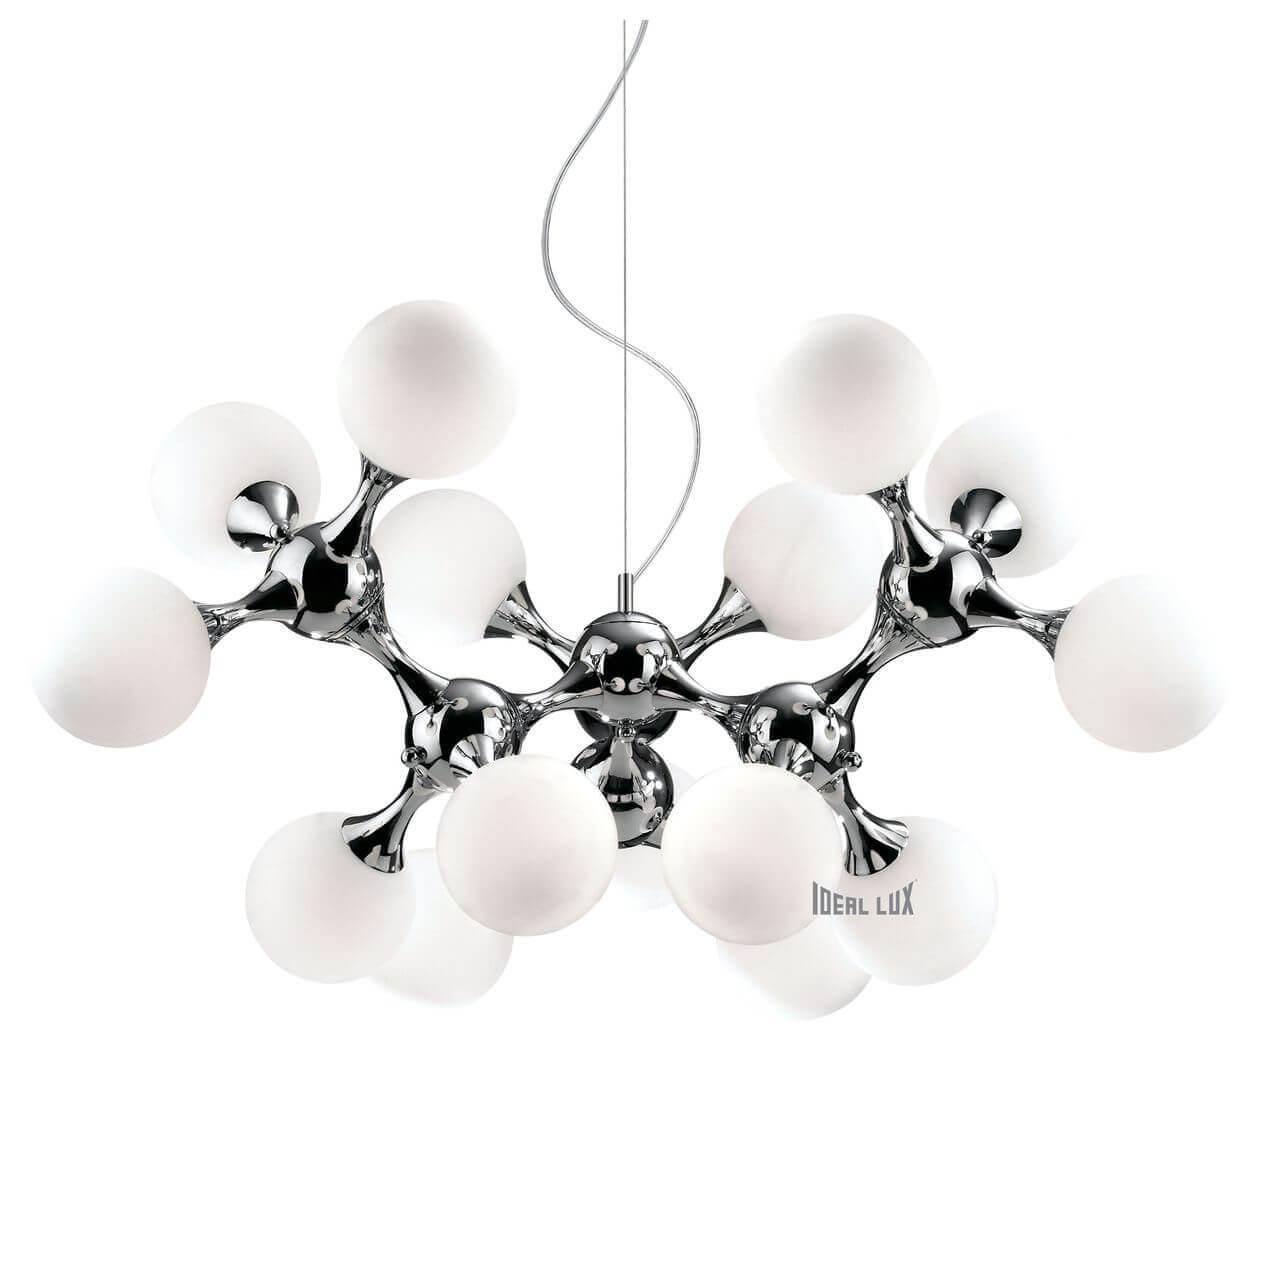 Подвесная люстра Ideal Lux Nodi Bianco SP15 ideal lux подвесная люстра colossal sp15 trasparente